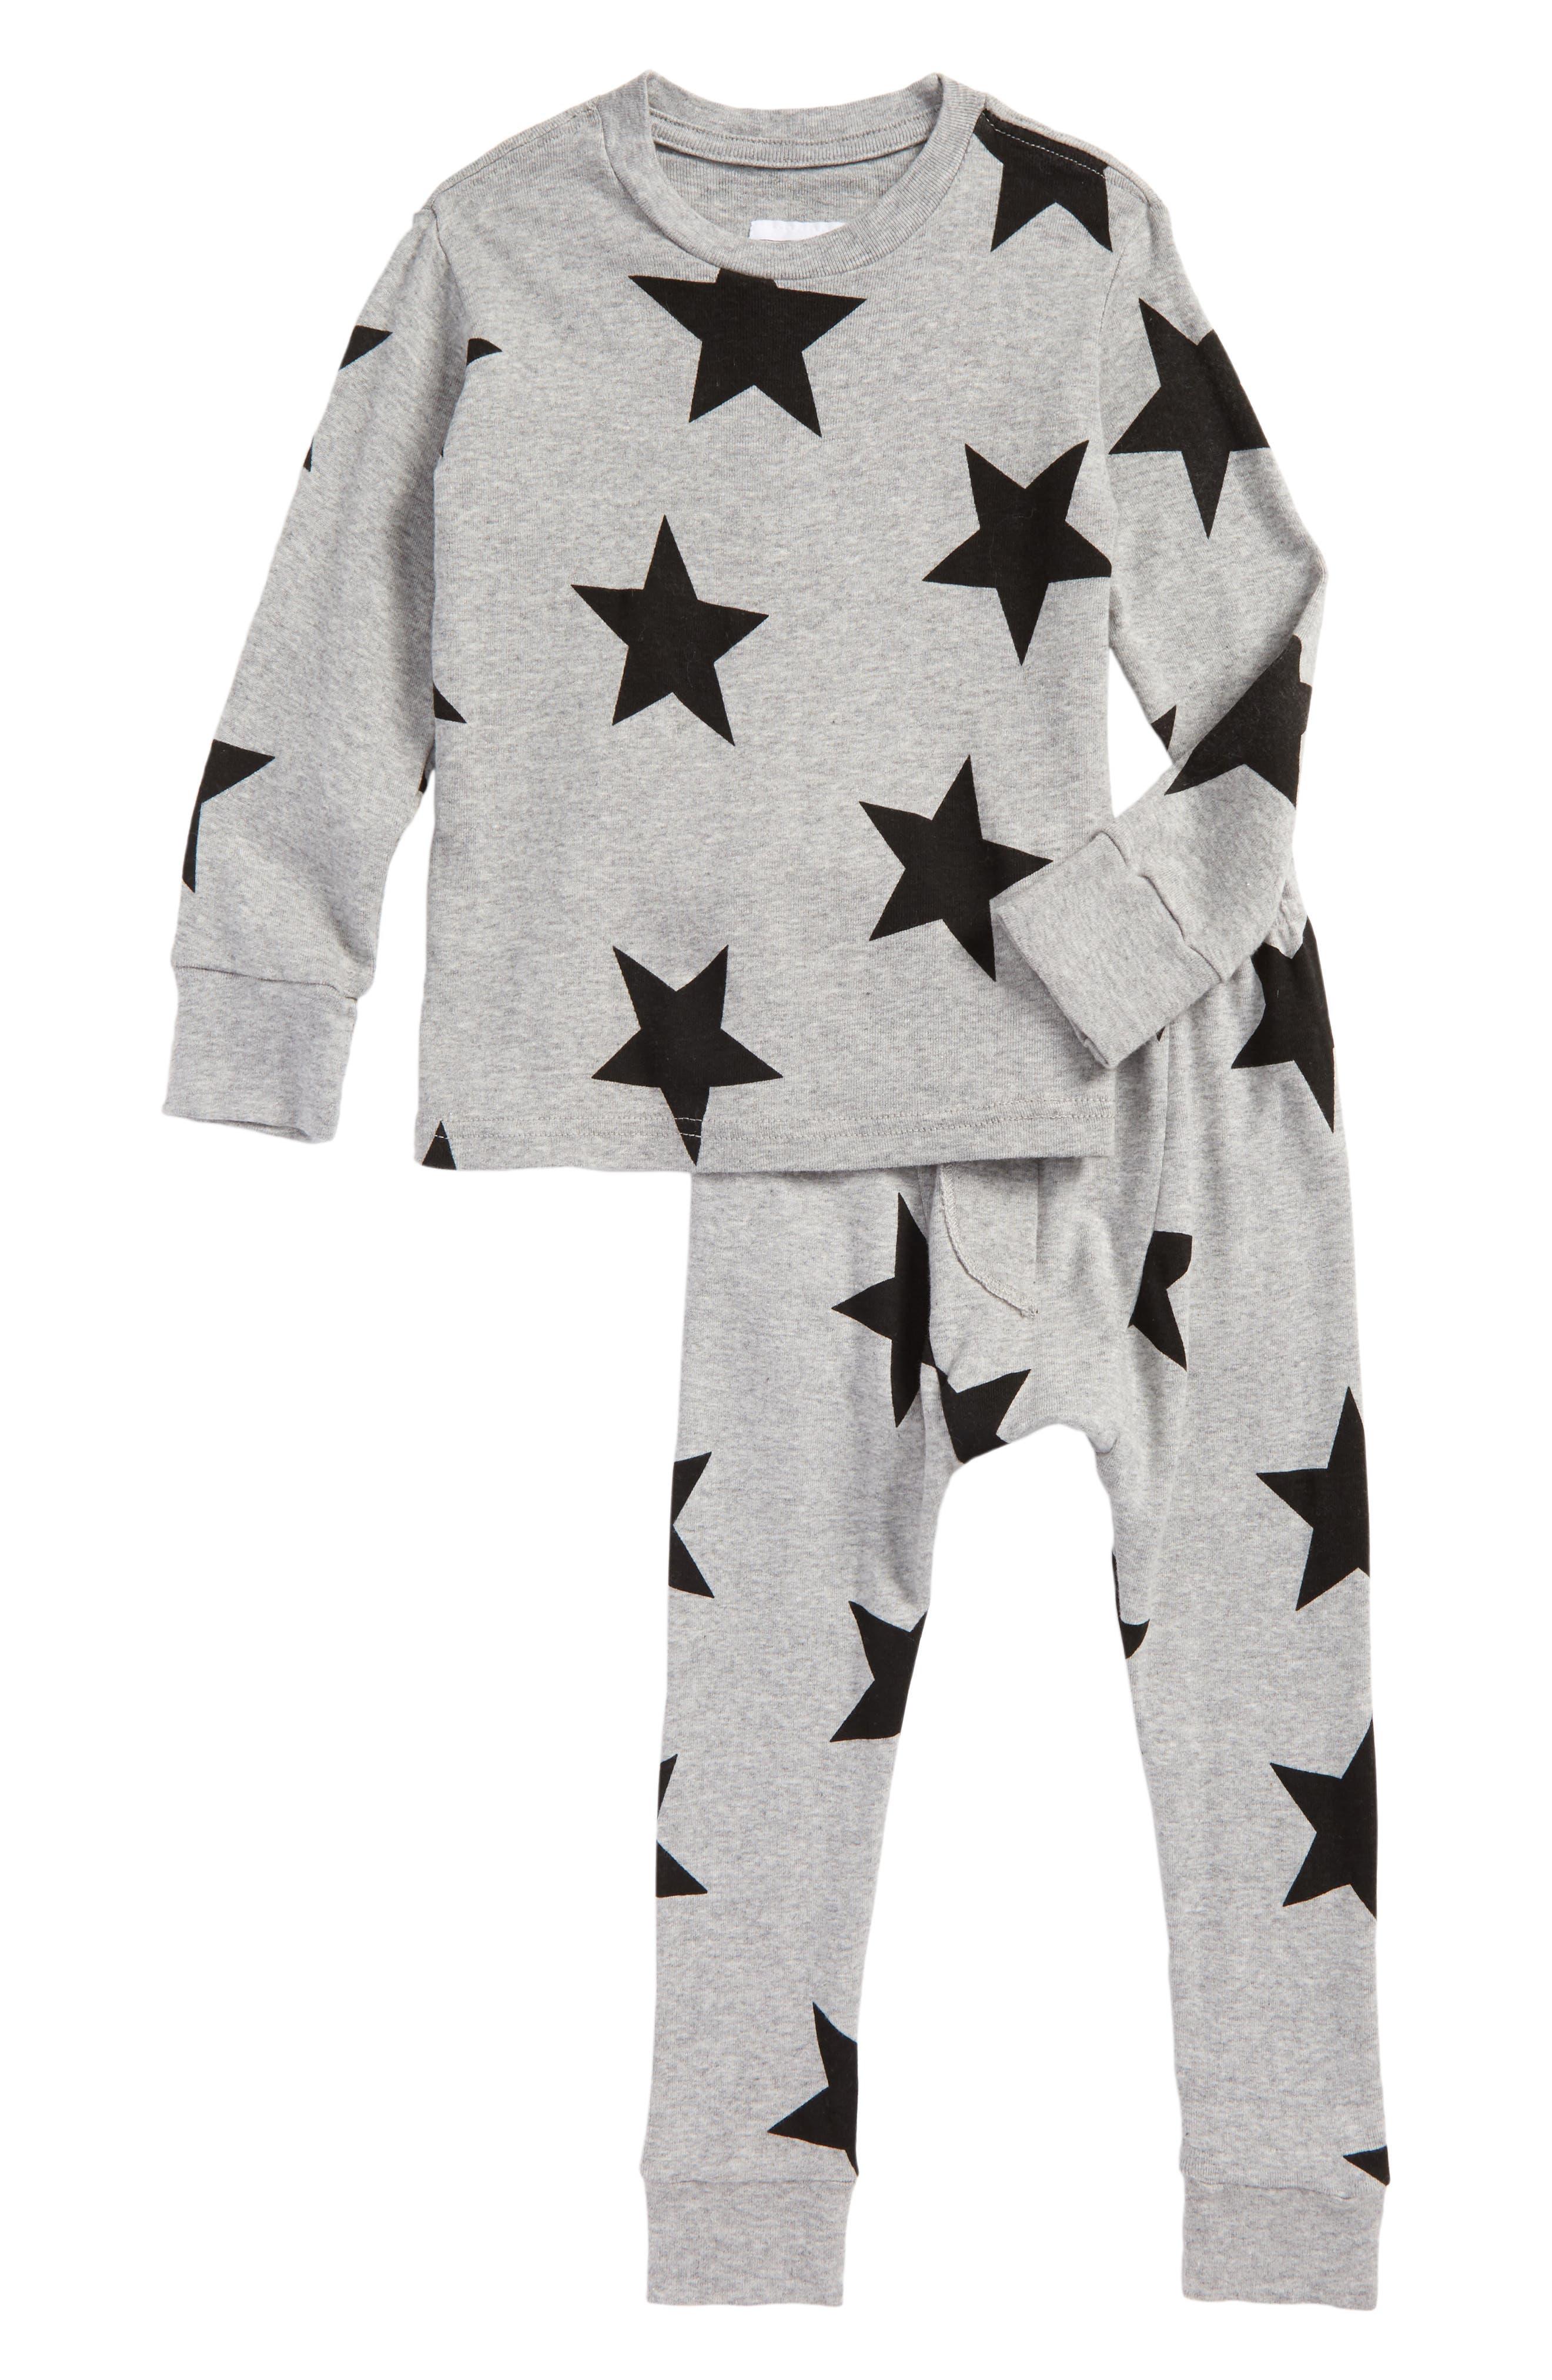 Alternate Image 1 Selected - NUNUNU Star Print T-Shirt & Pants Set (Toddler Boys & Little Boys)